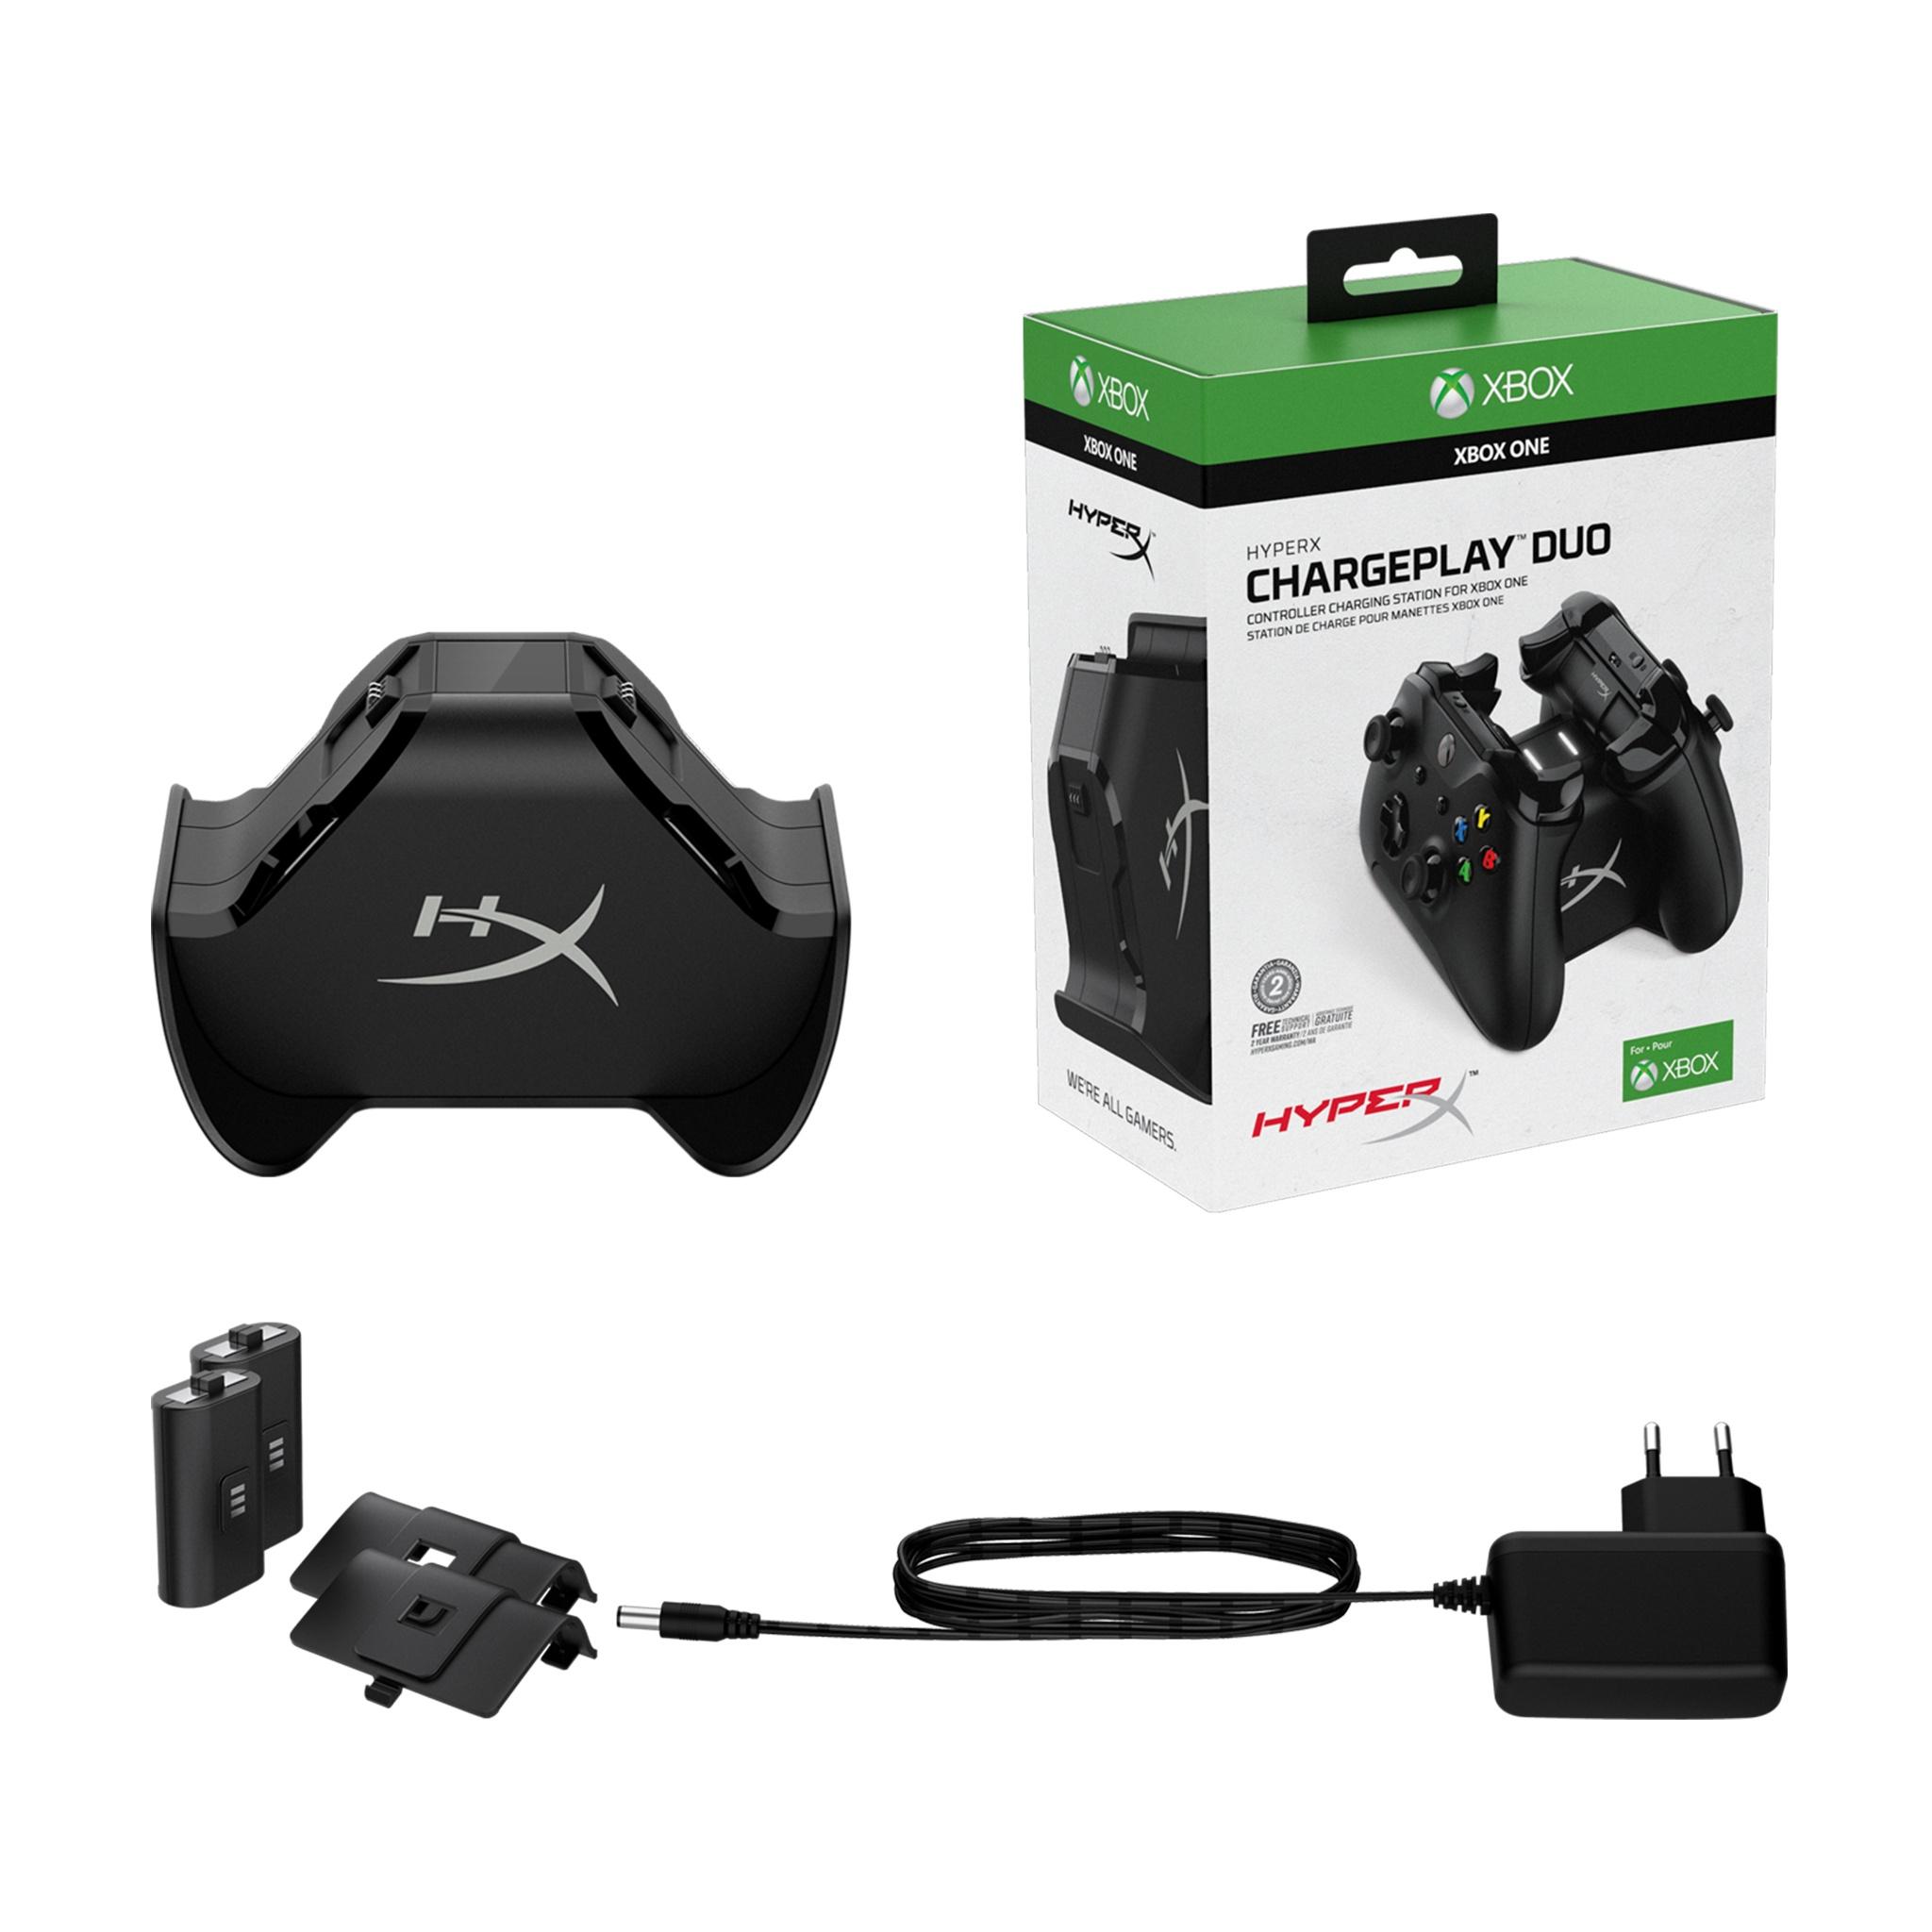 Statie de incarcare a controlerelor XBOX HyperX ChargePlay Duo (HX-CPDUX-C)